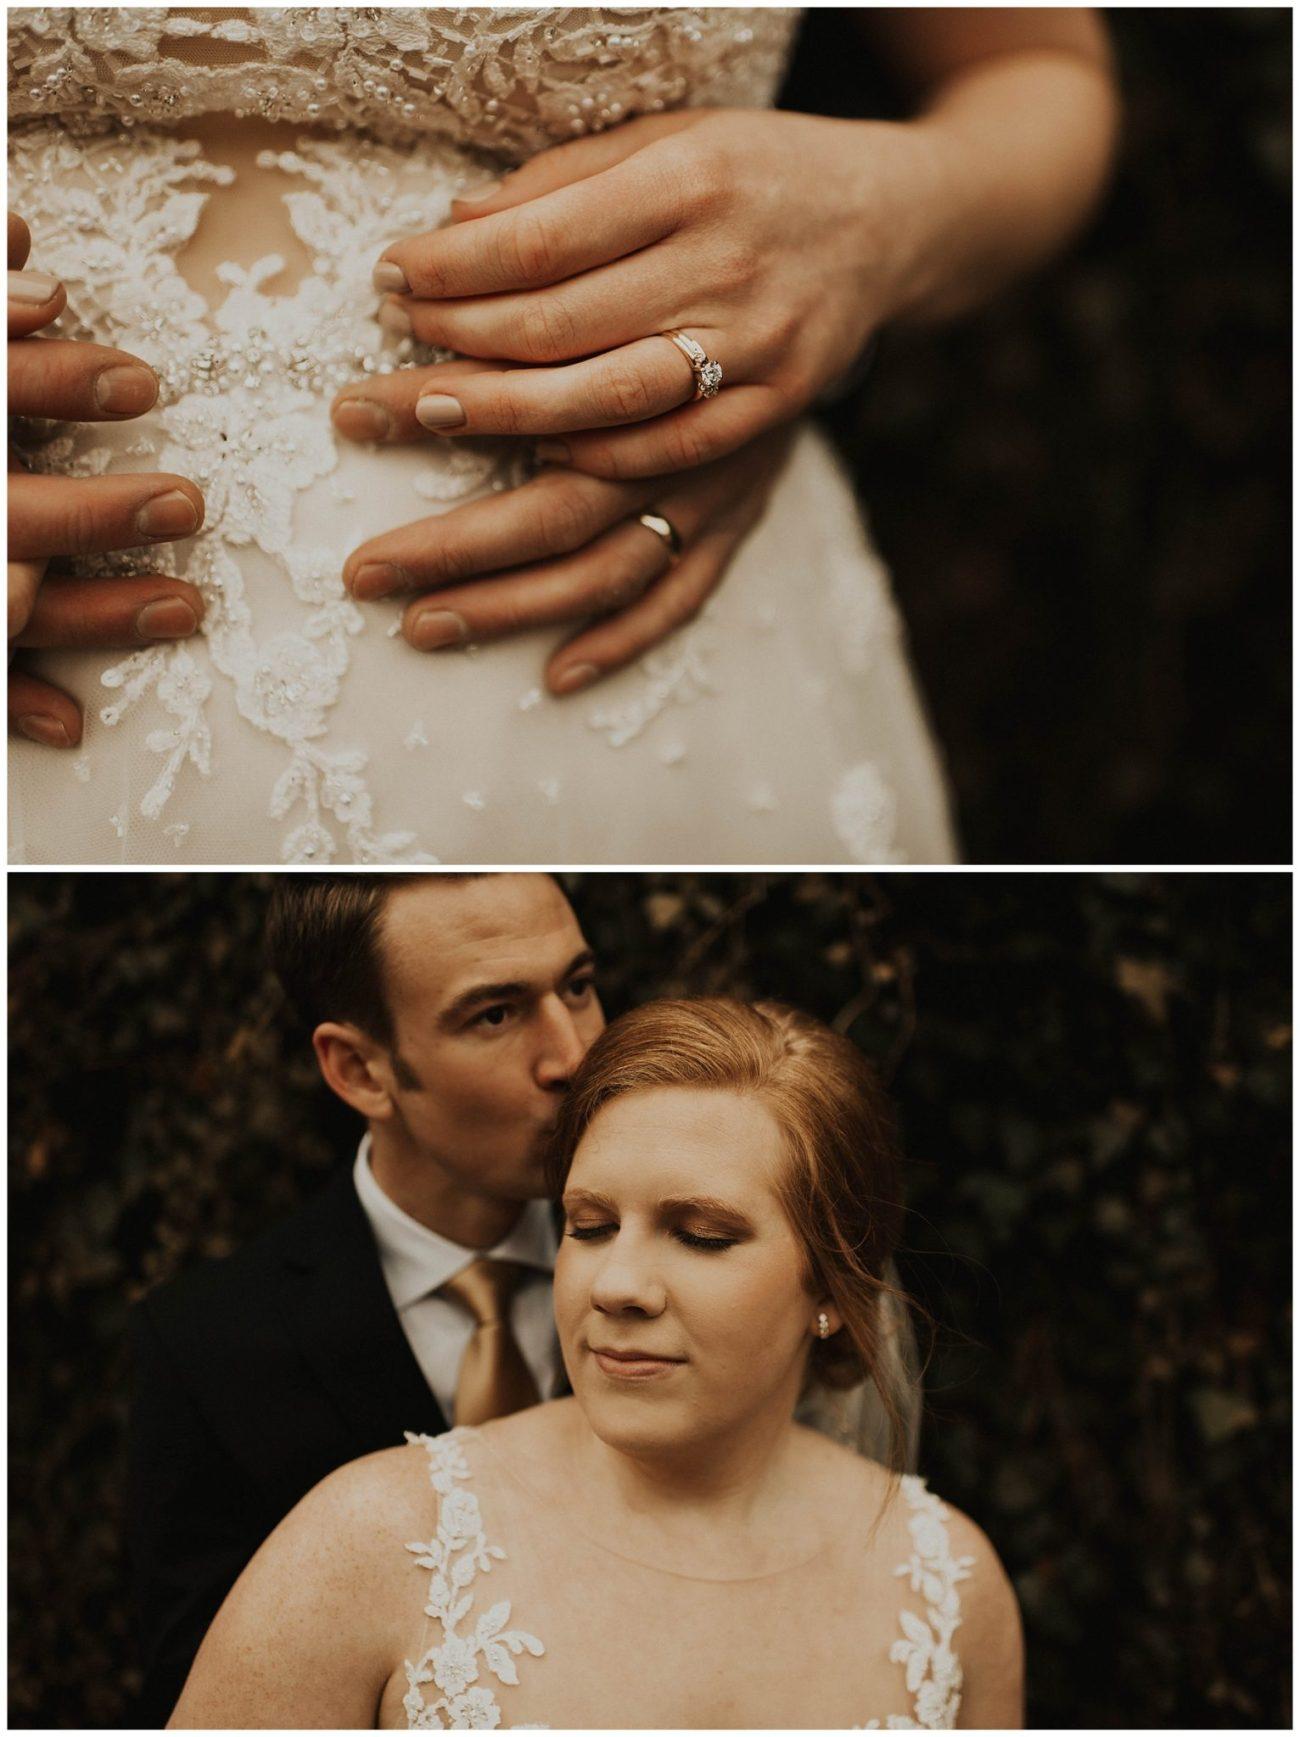 83f7440b67db52 Johnny + Eliza // Classic Winter Wedding - Lauren F.otography ...